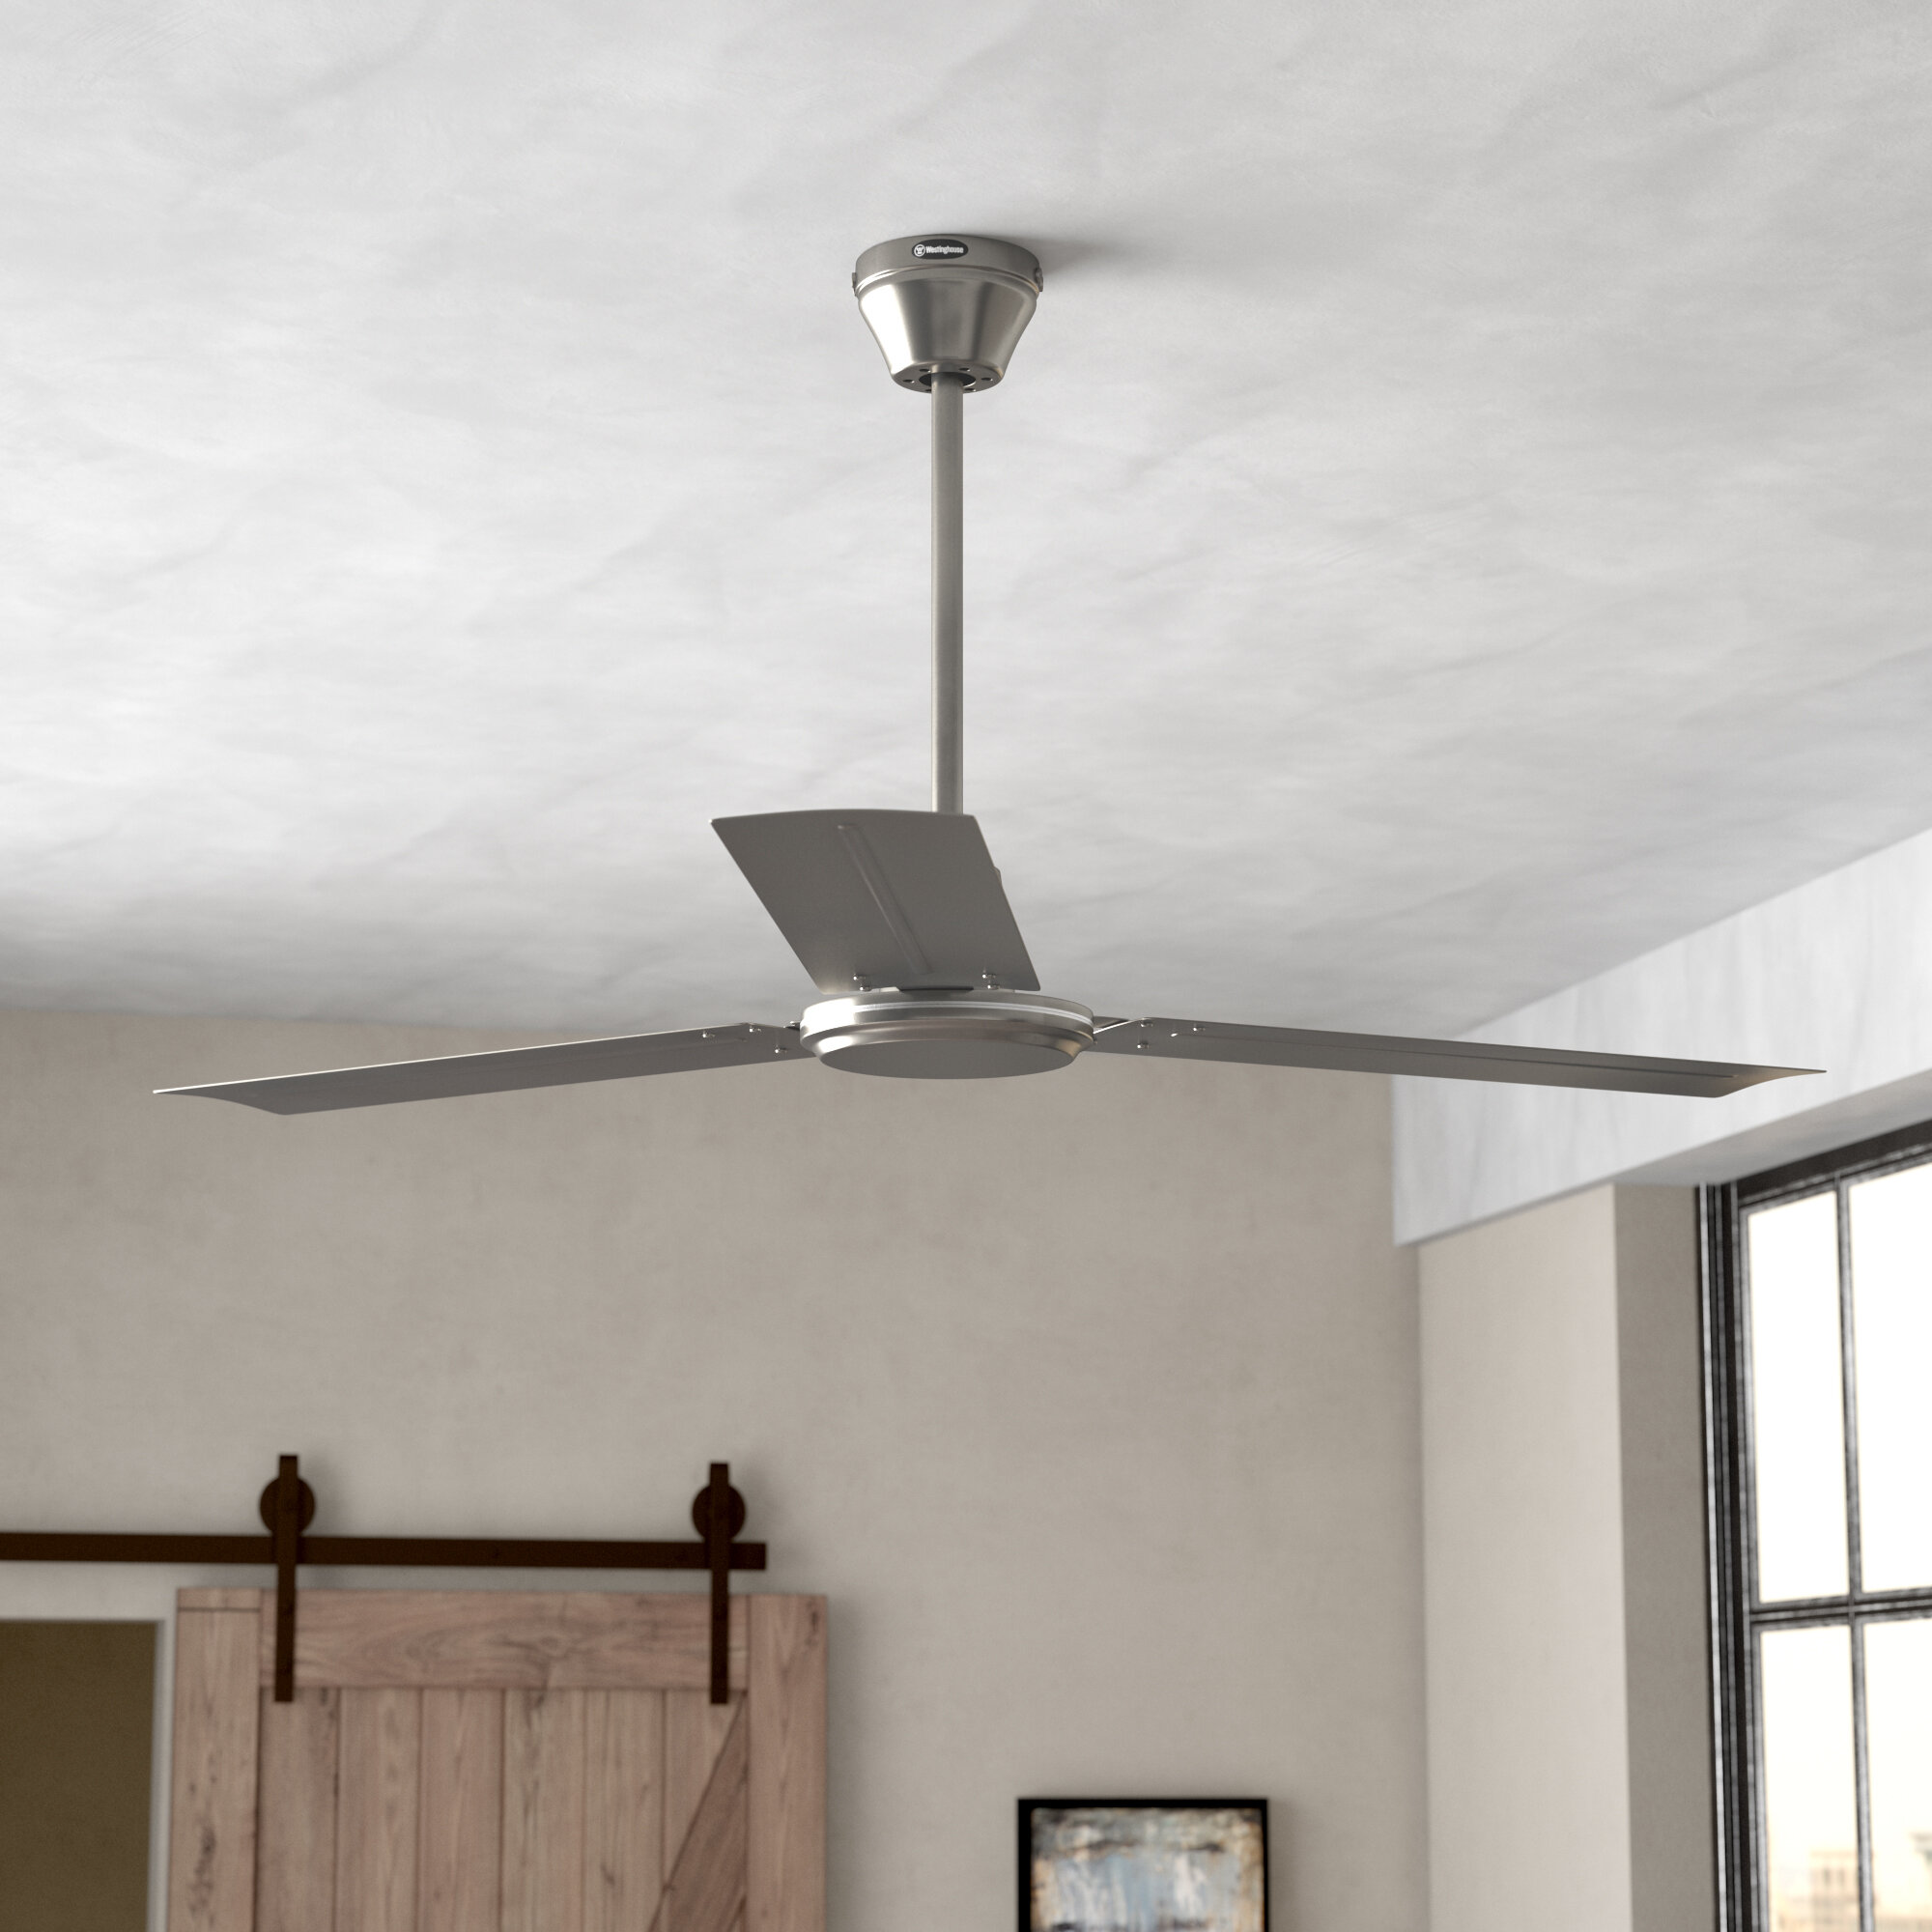 Zipcode Design 56 Emil 3 Blade Industrial Ceiling Fan Reviews Wiring On Fans Accessories Wayfair